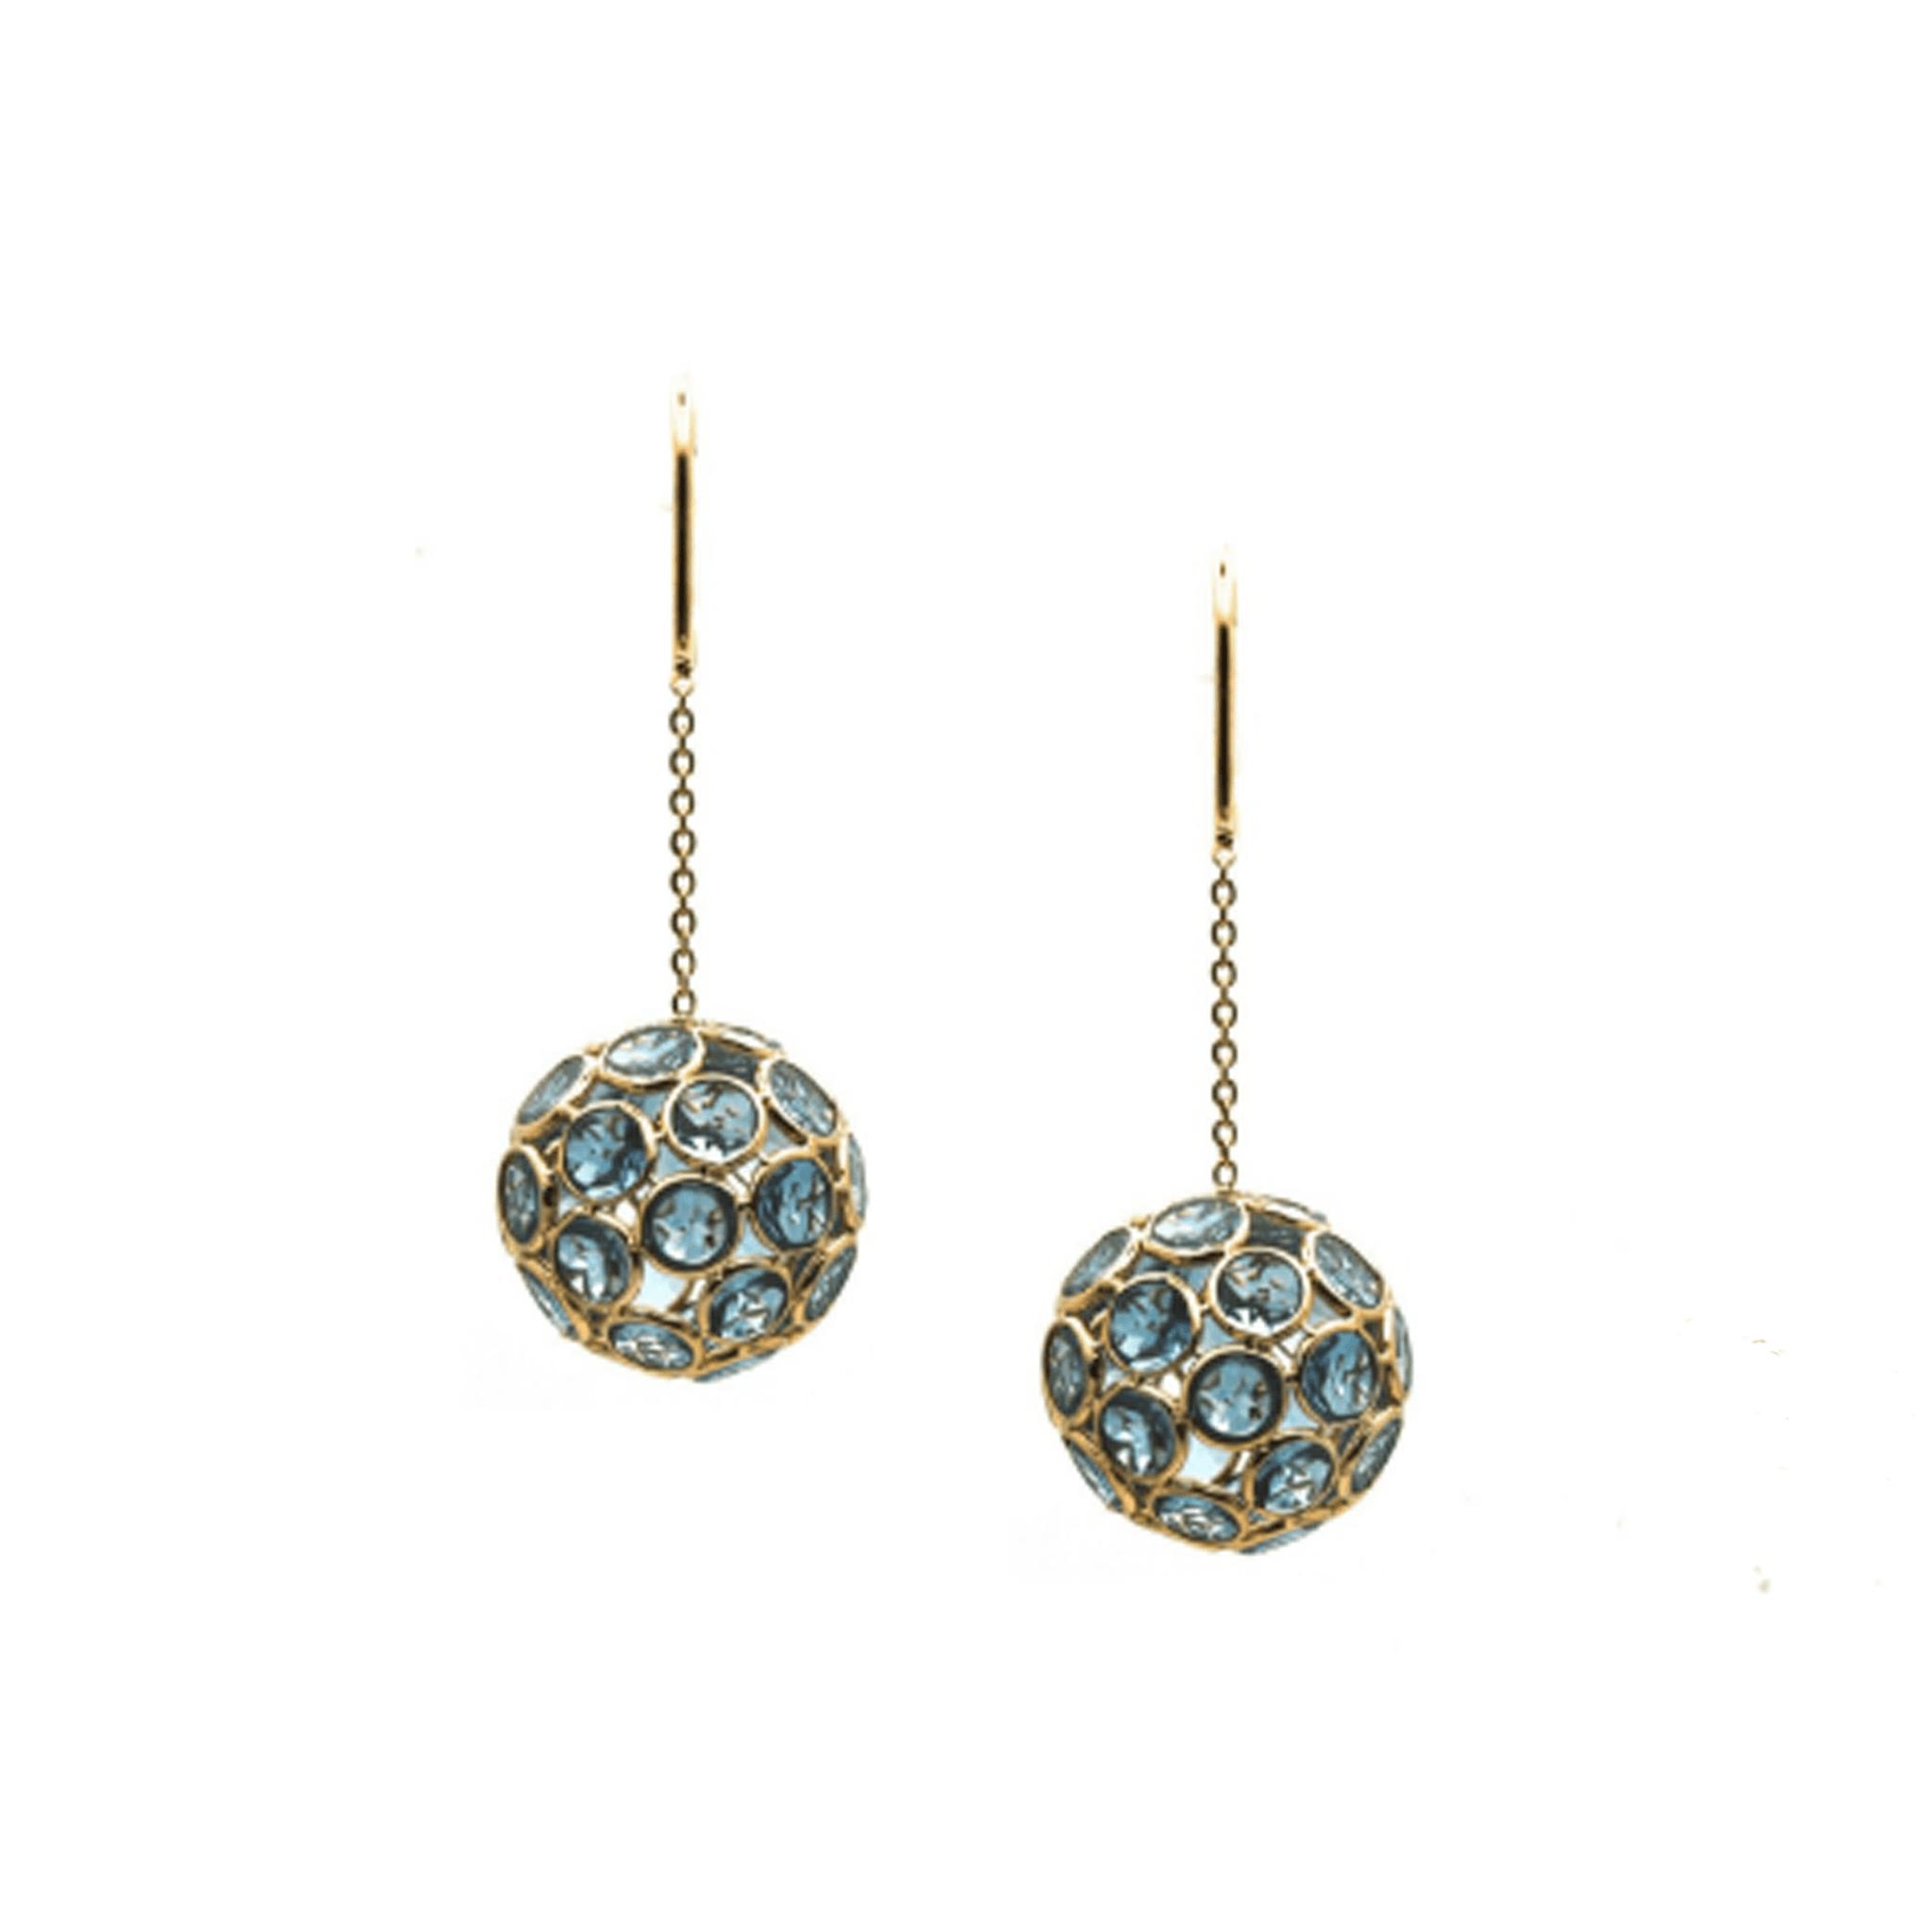 Tresor Collection - Gemstone Sphere Ball Dangle Earrings in 18k Yellow Gold